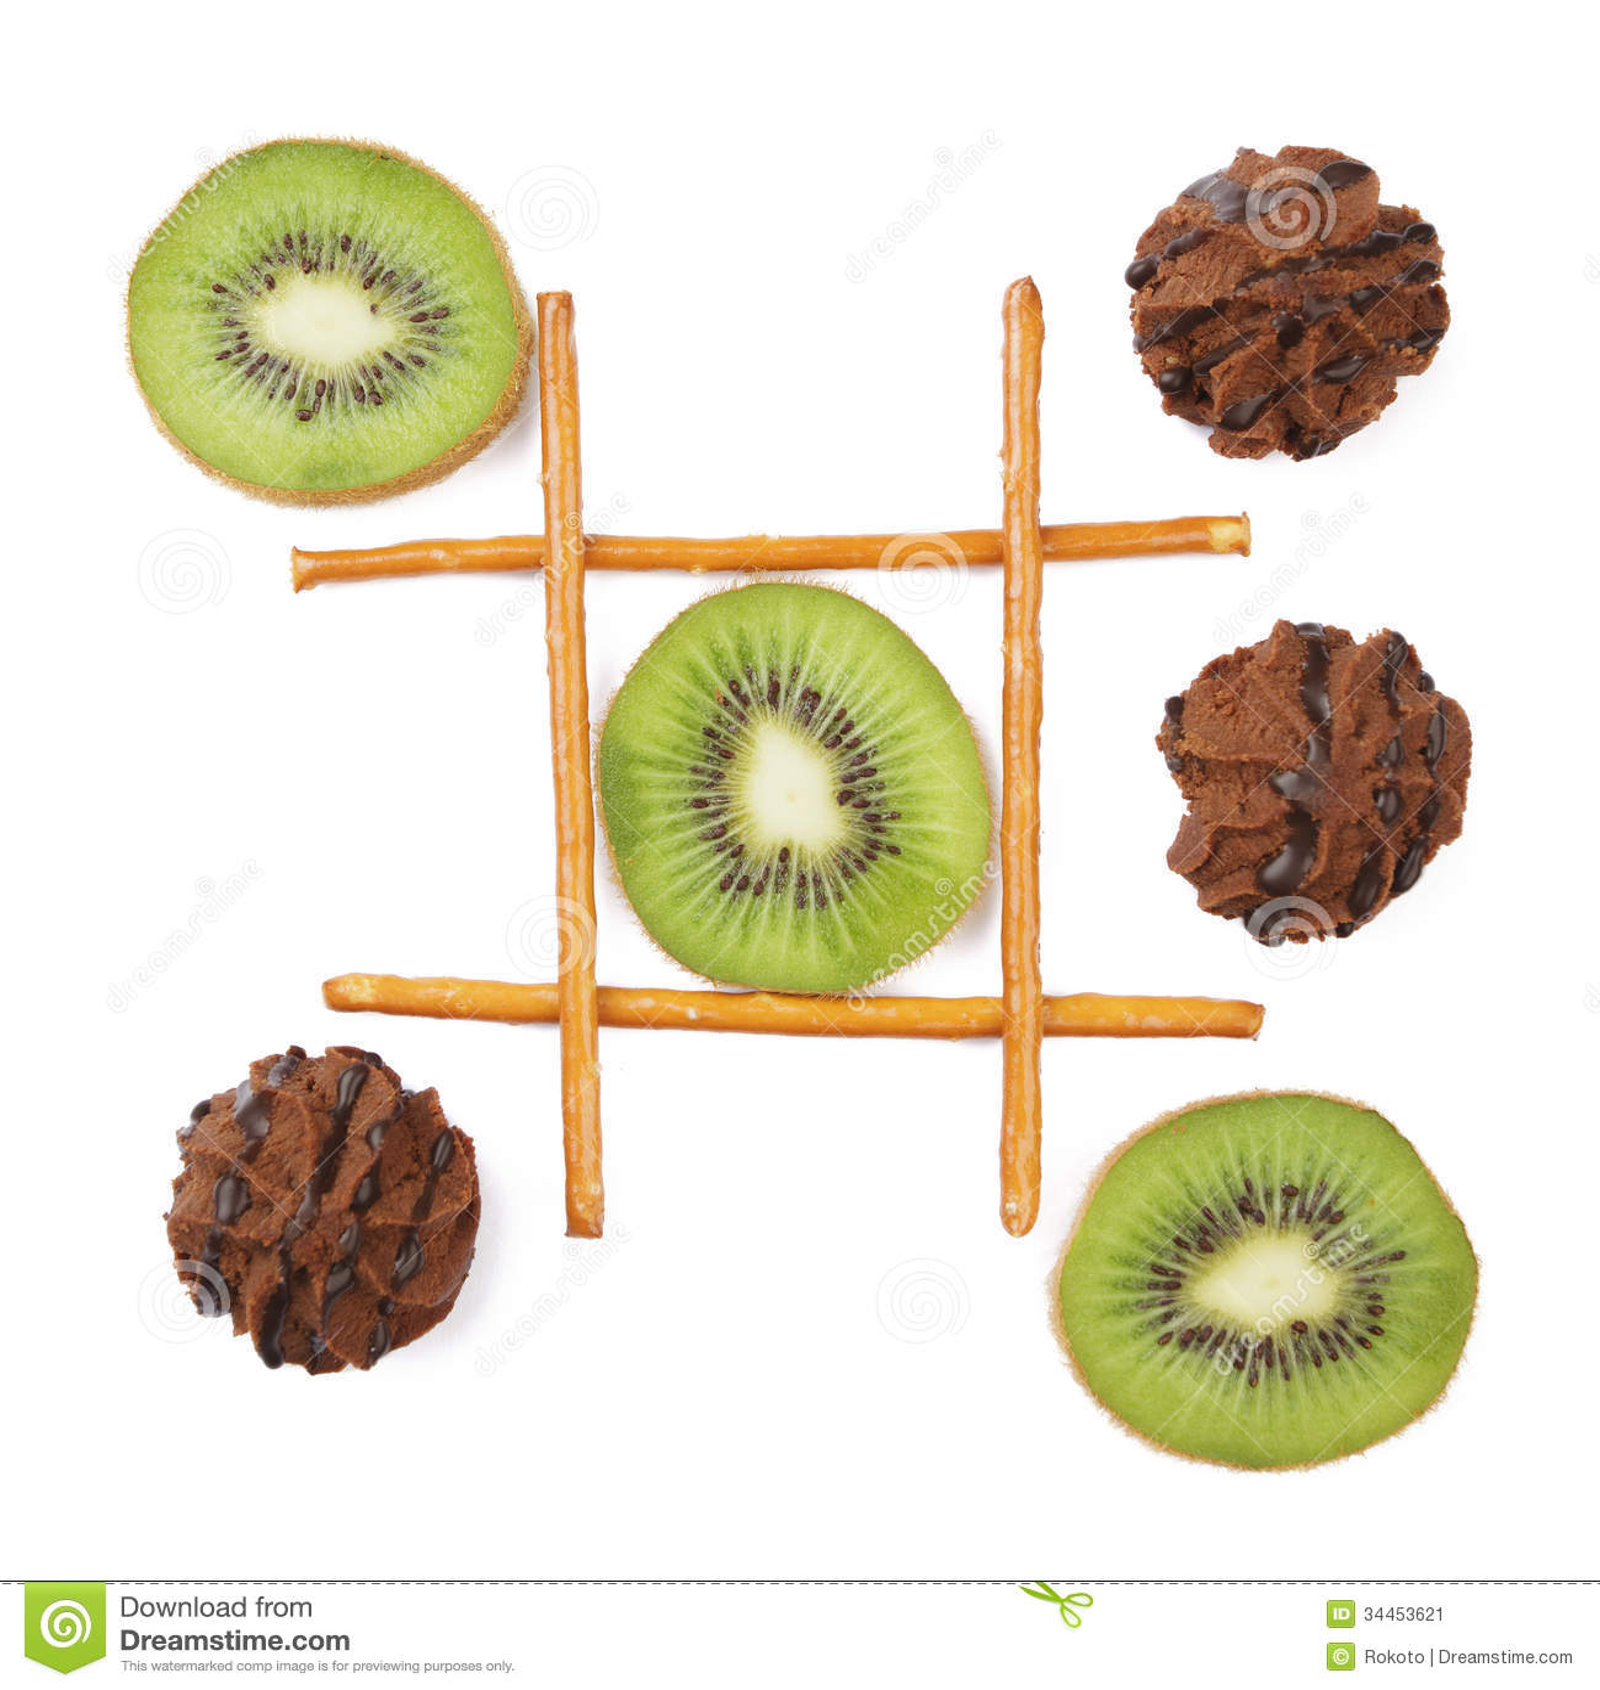 Healthy Food Healthy Unhealthy Food Game